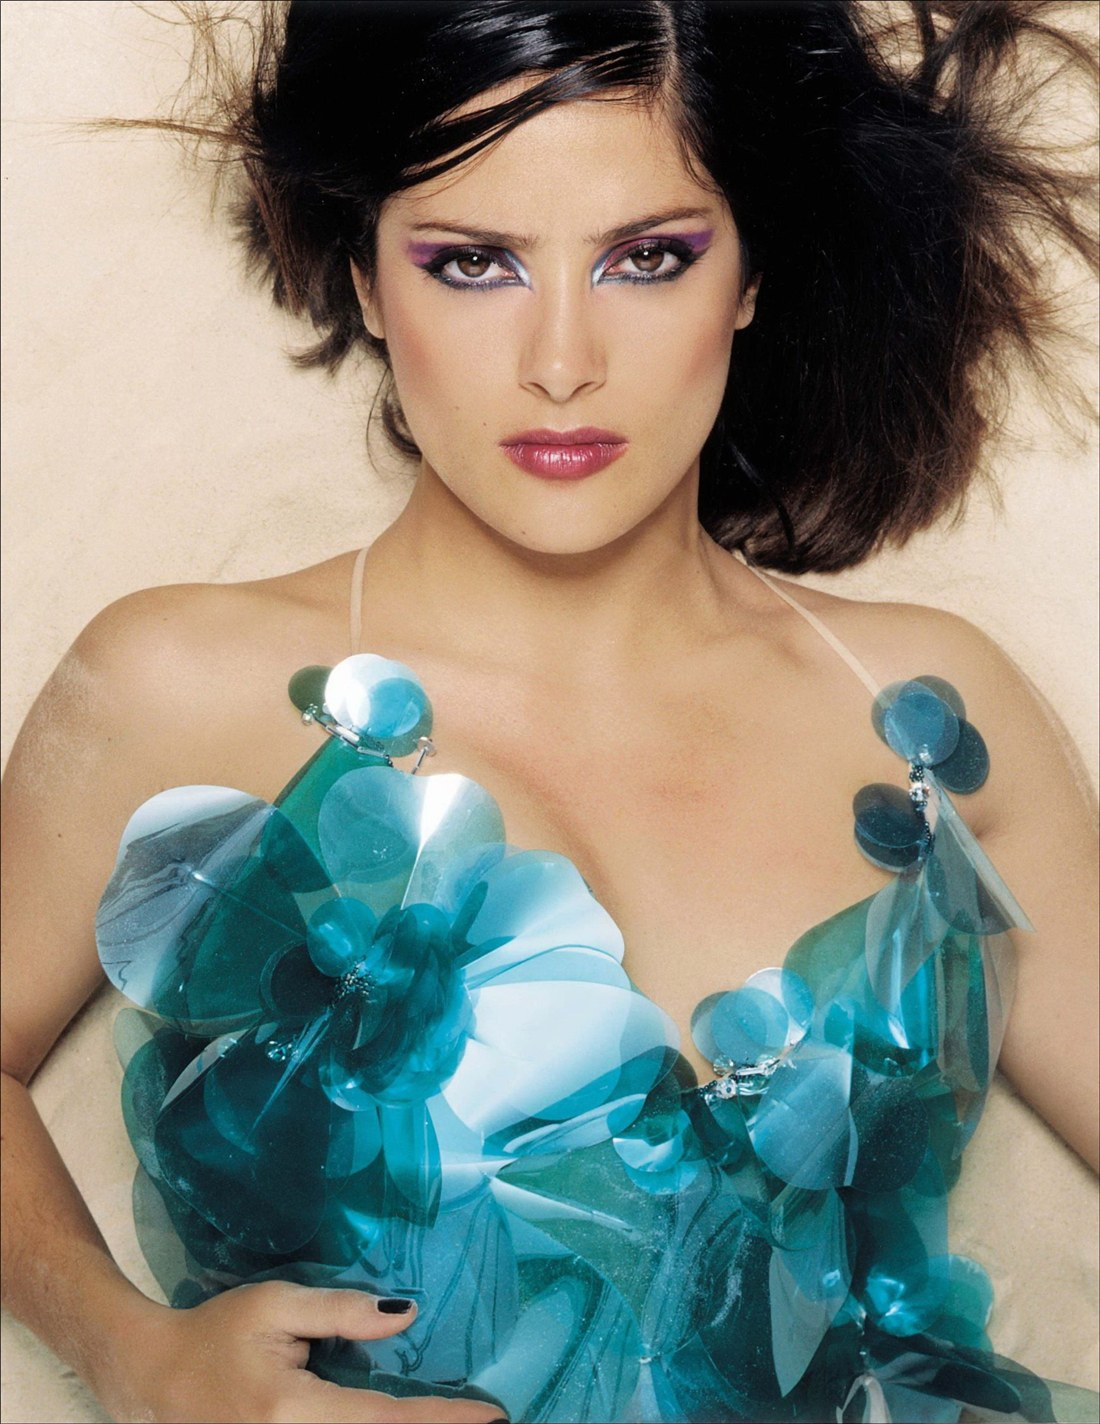 http://4.bp.blogspot.com/_hEeDlsg8wA4/TSbpw6S6gMI/AAAAAAAABiE/7A5tHEuN7v0/s1600/Salma_Hayek_-_Looks_Great_at_Flaunt_Magazine_Shoot_01.jpg